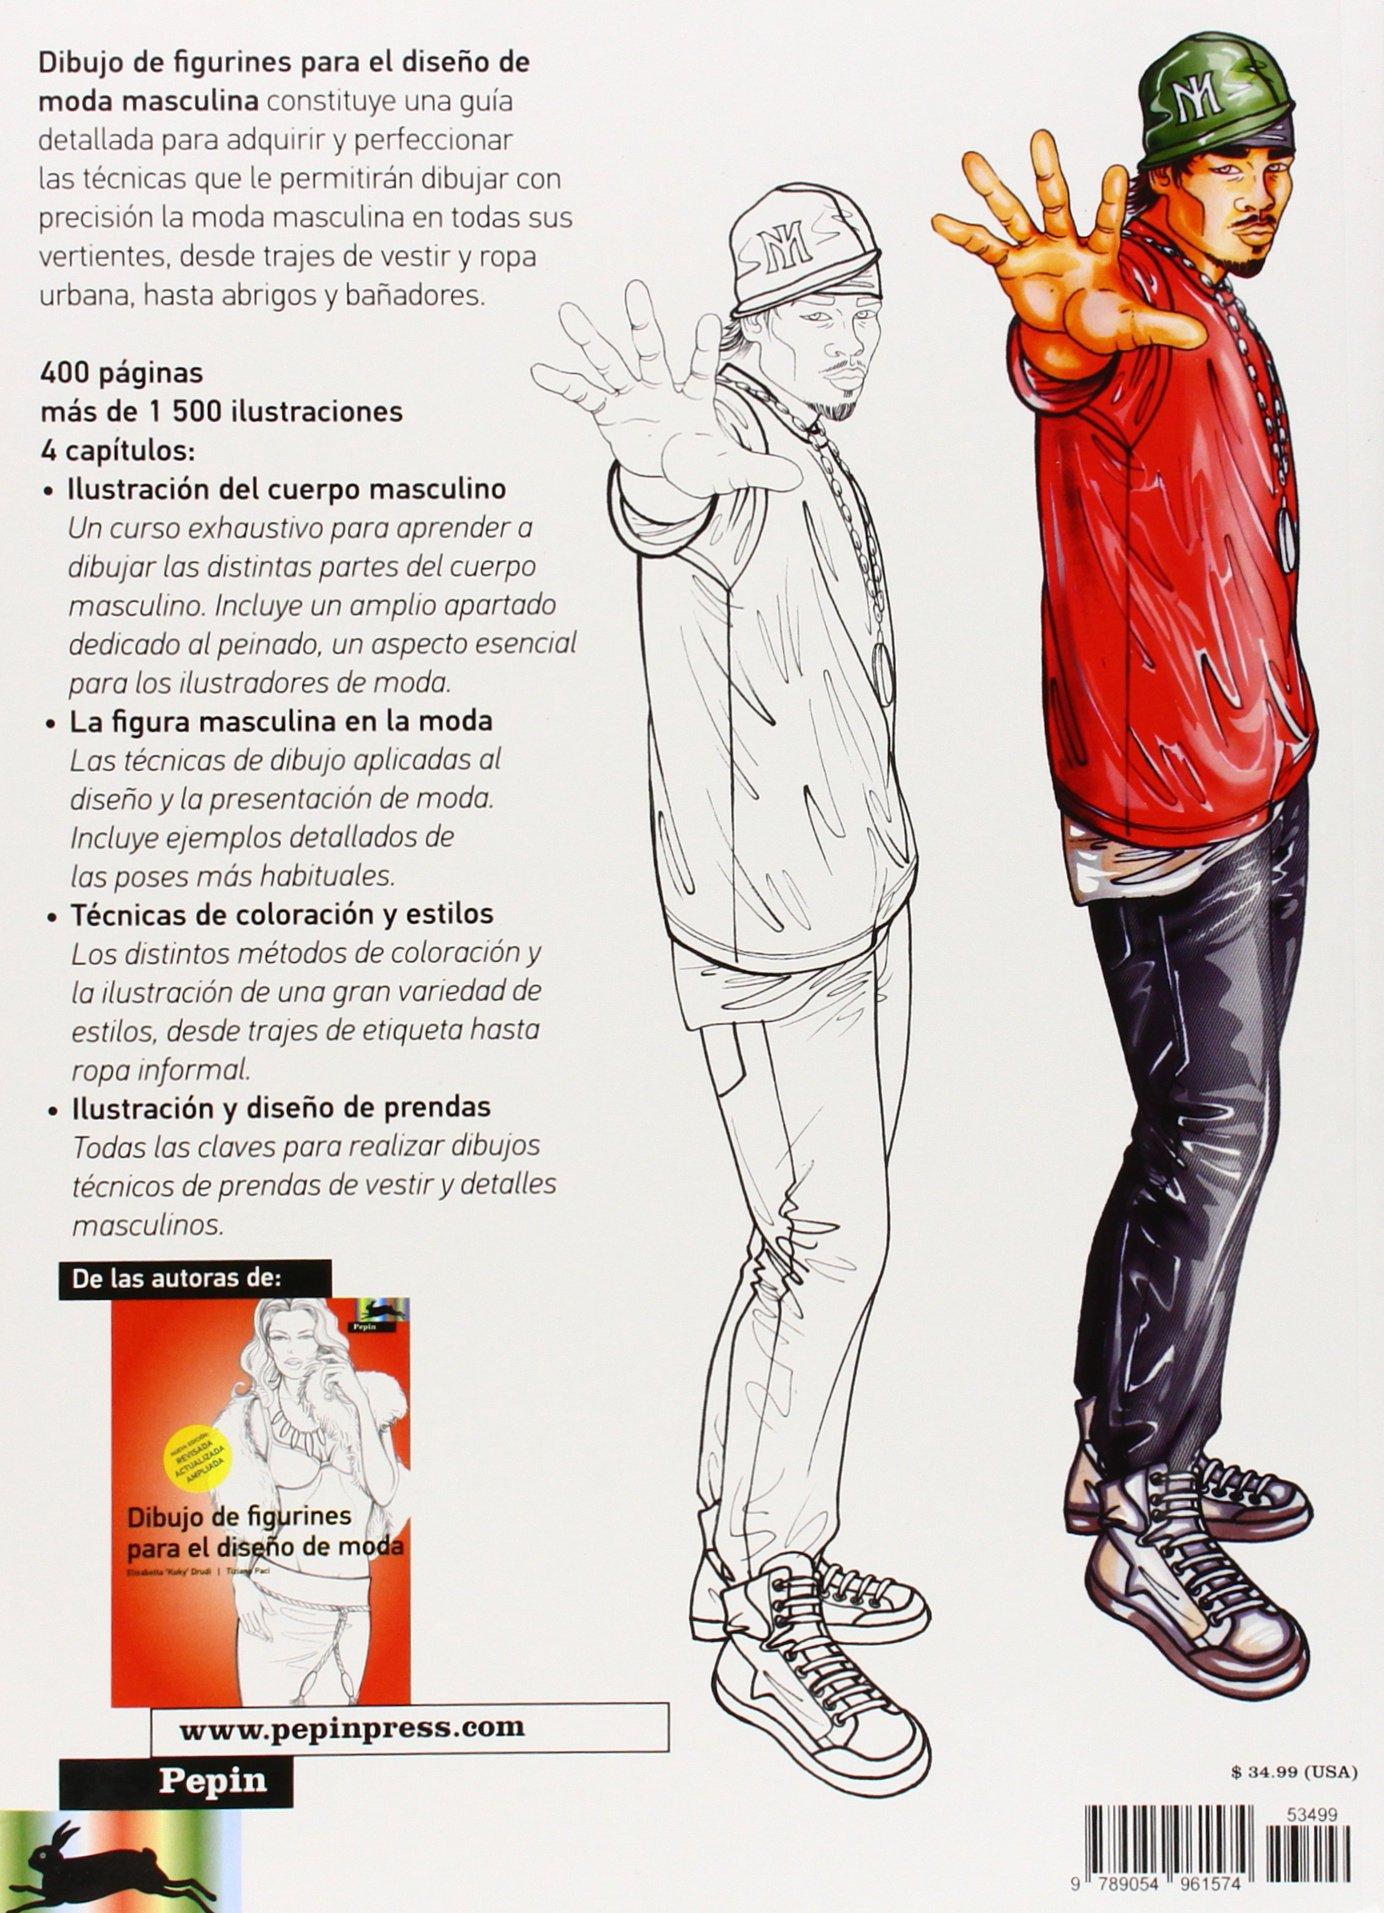 Dibujo de Figurines Para El Diseno De Moda Masculina: Elisabetta Drudi: 9789054961574: Amazon.com: Books